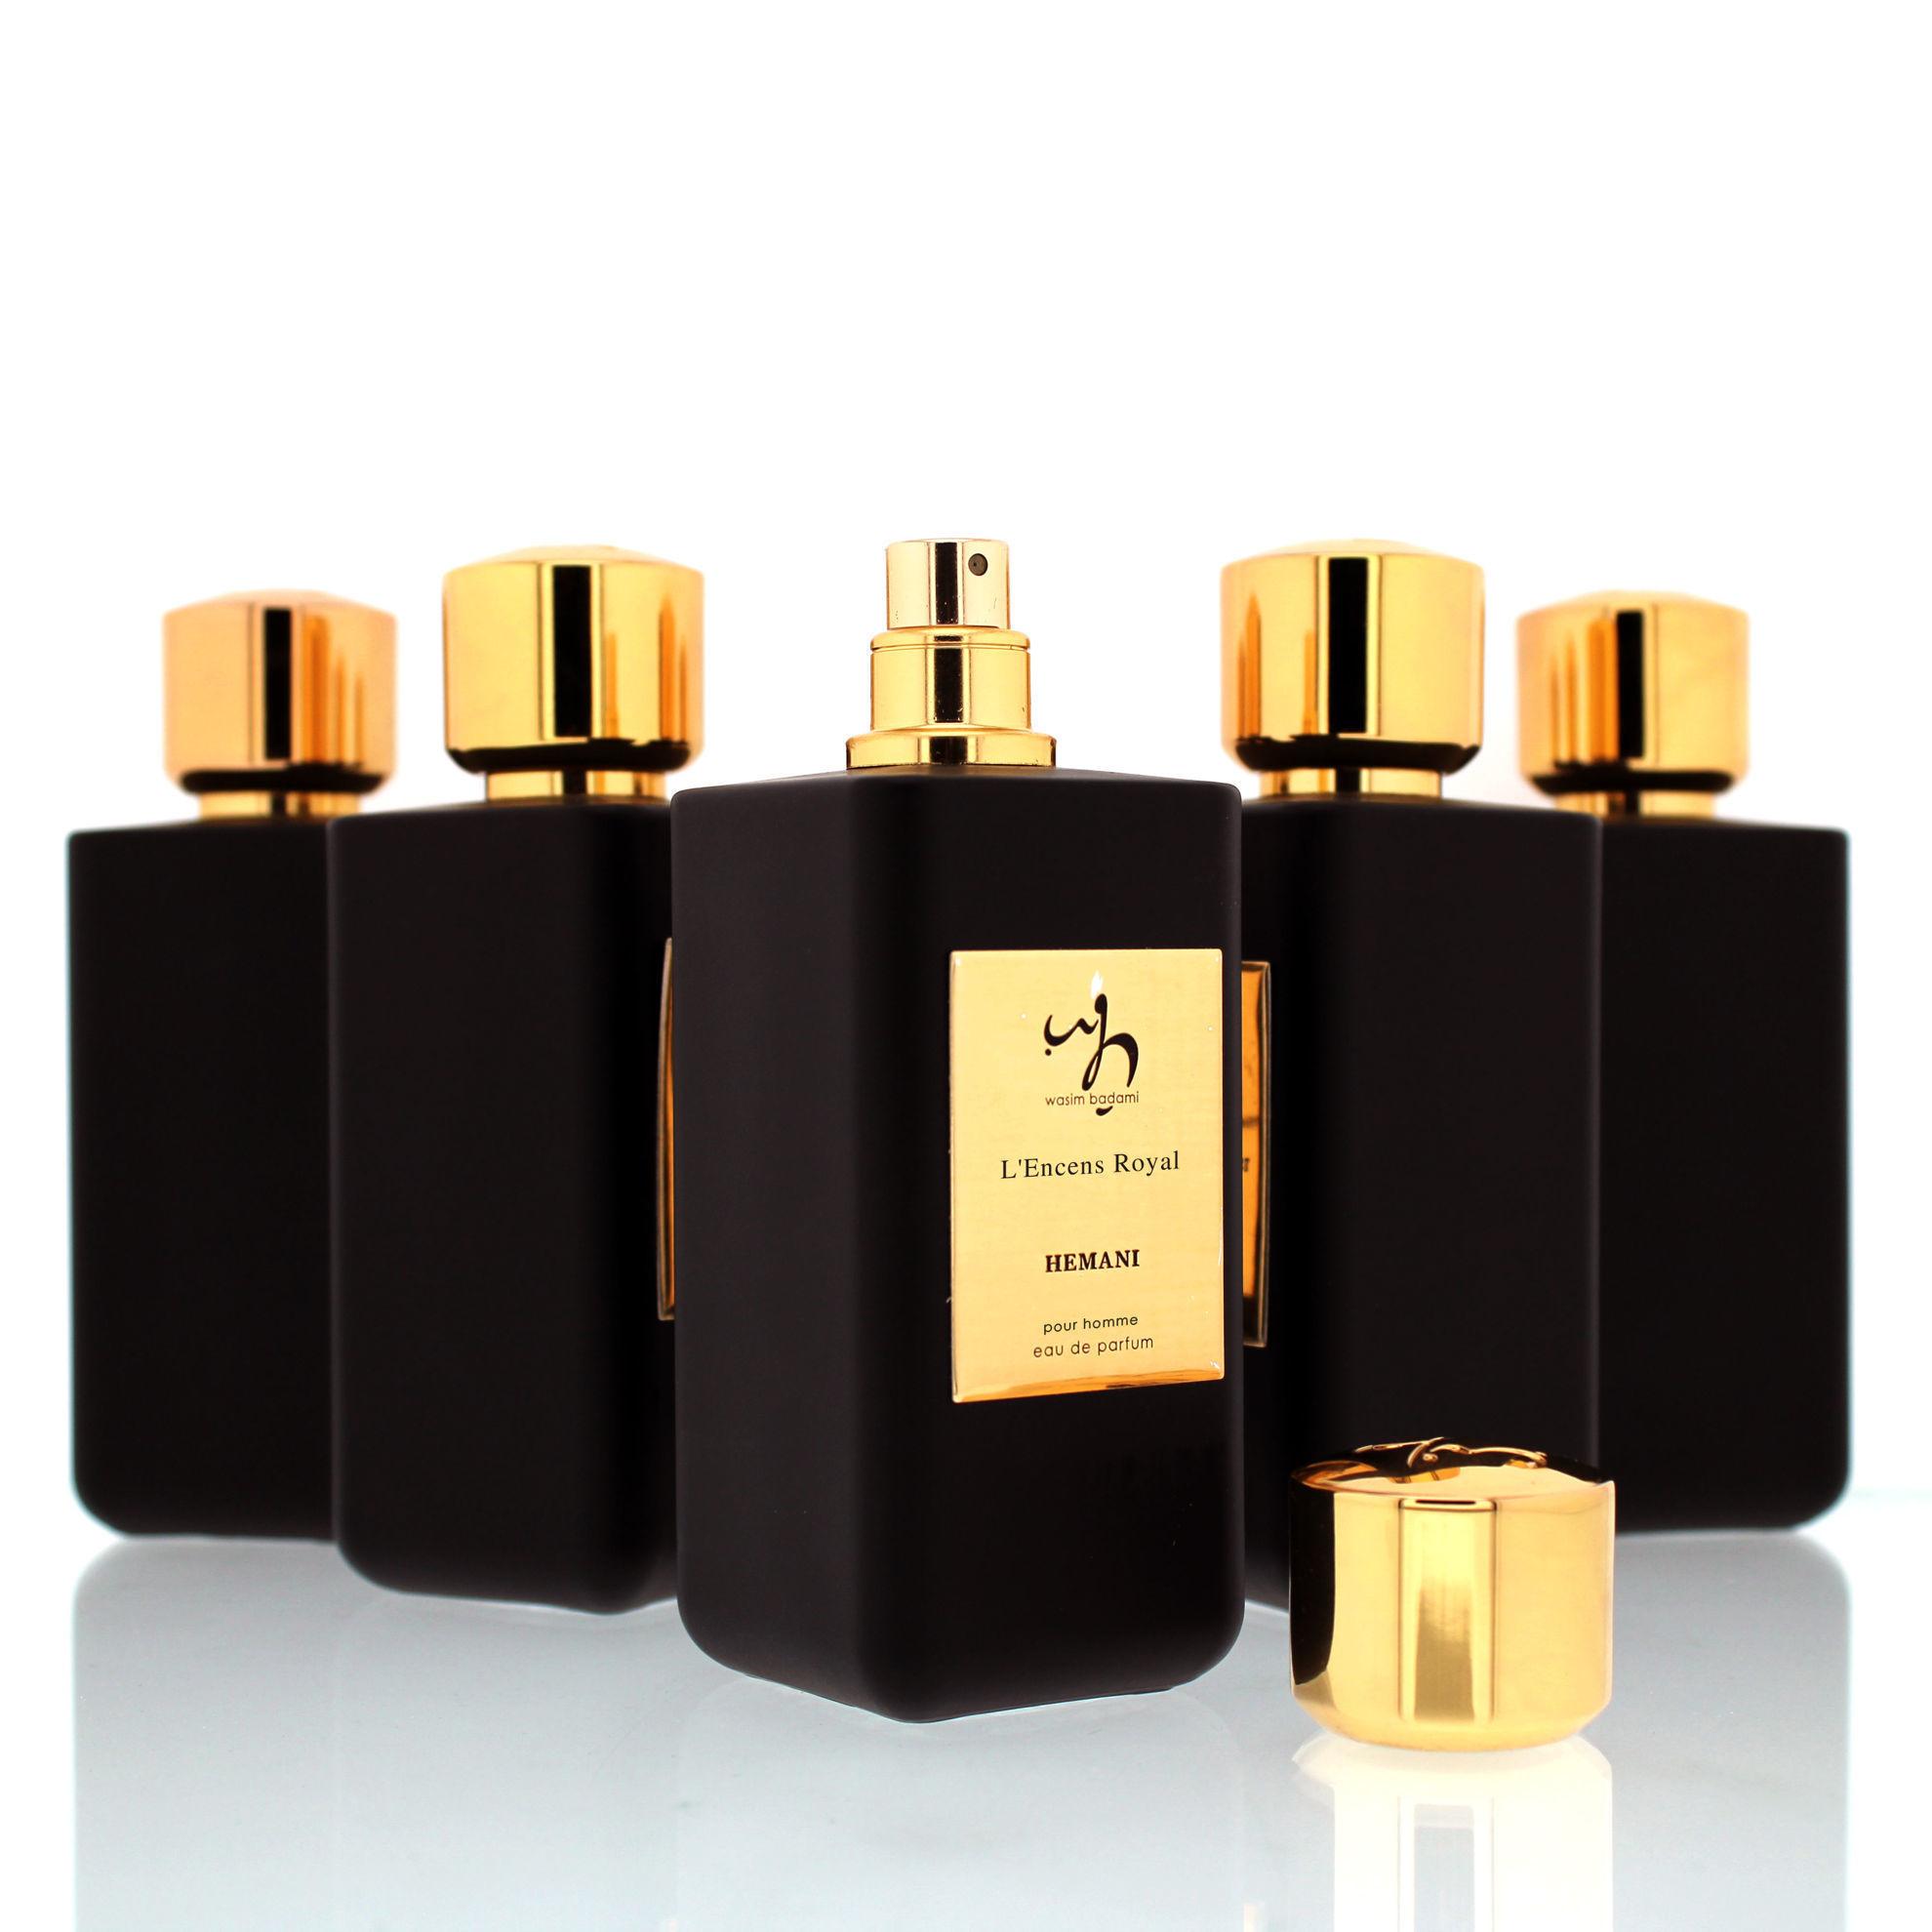 L'Encens Royal Perfume for Men